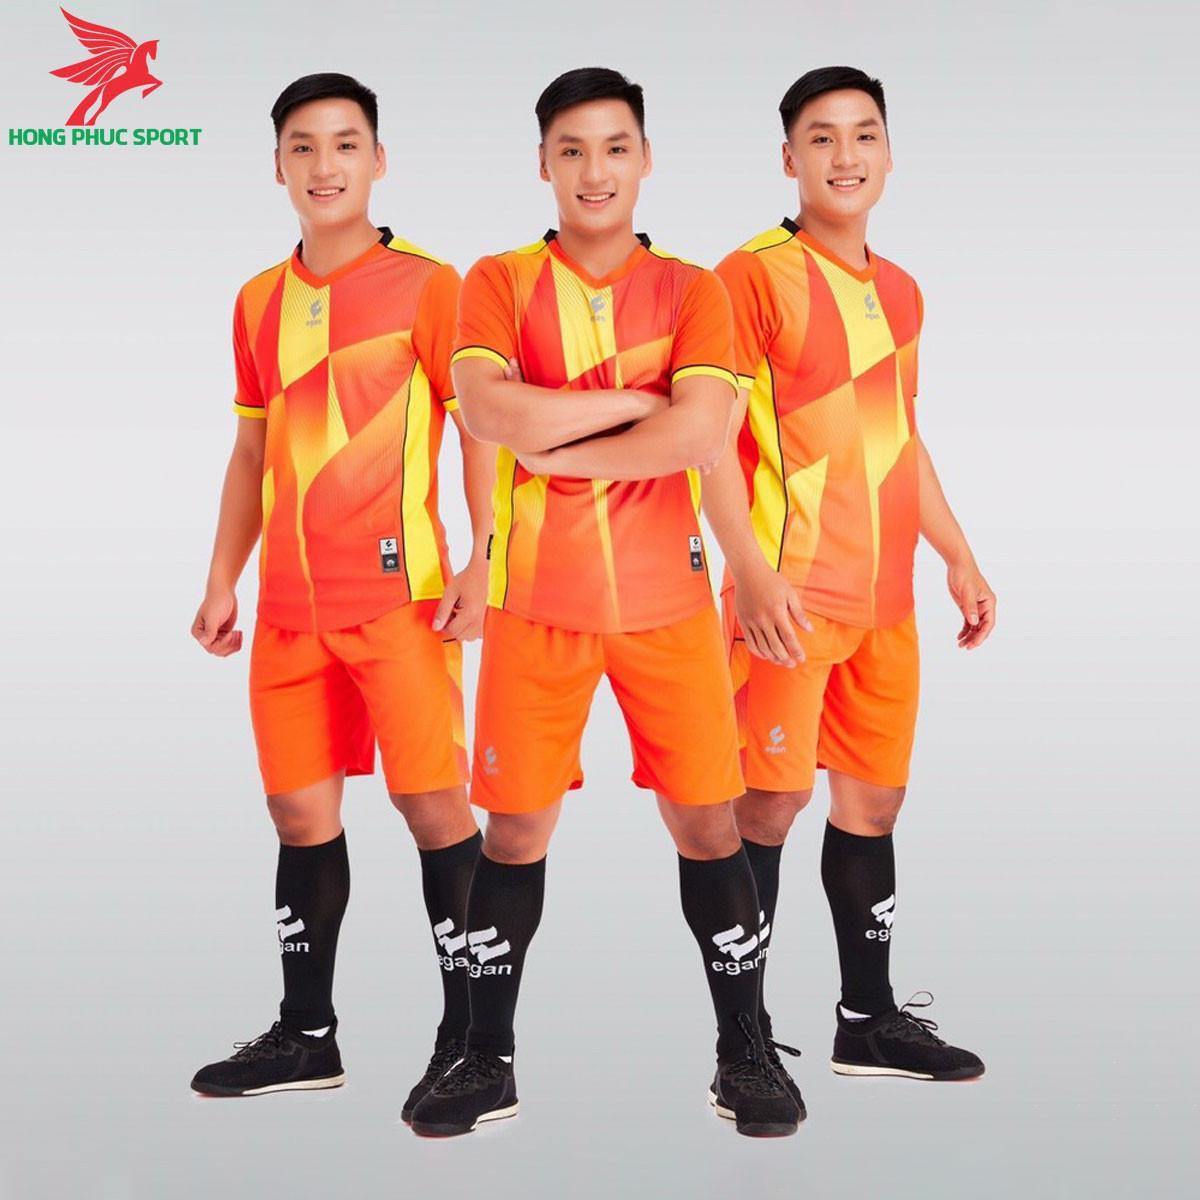 https://cdn.hongphucsport.com/unsafe/s4.shopbay.vn/files/285/ao-da-bong-khong-logo-egan-victory-mau-cam-605083df7ba7d.jpg